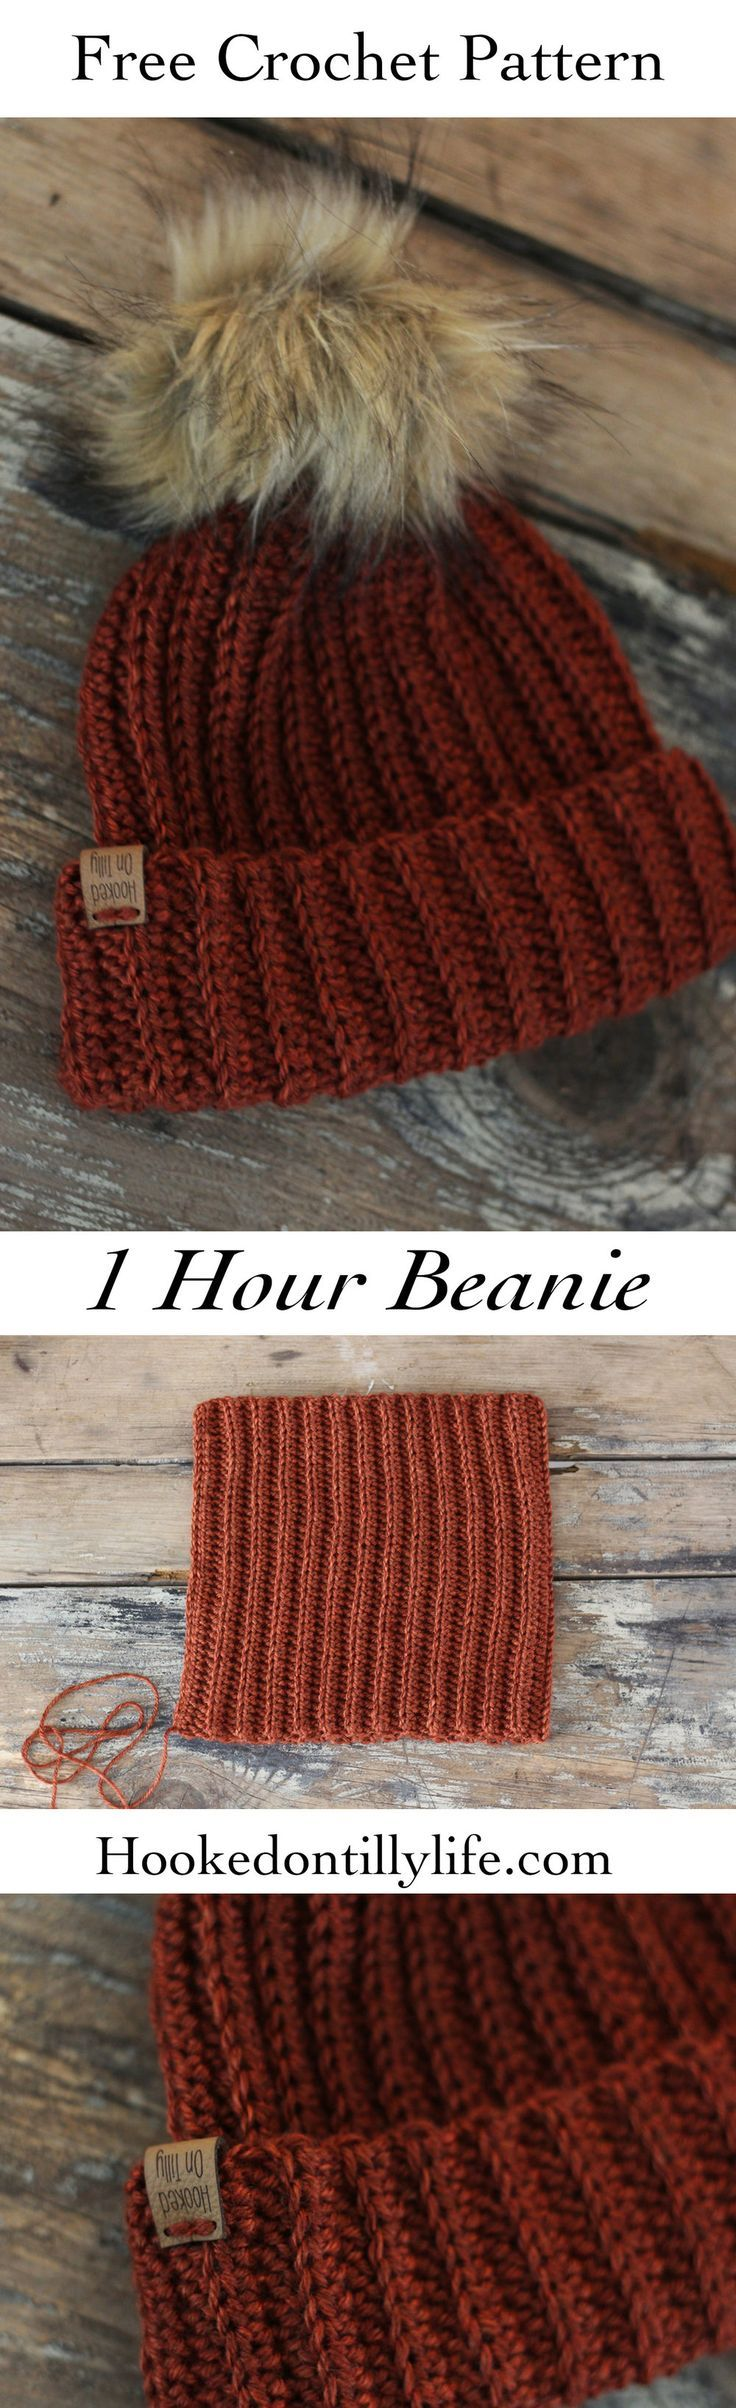 Woodland Beanie – Free Crochet Pattern